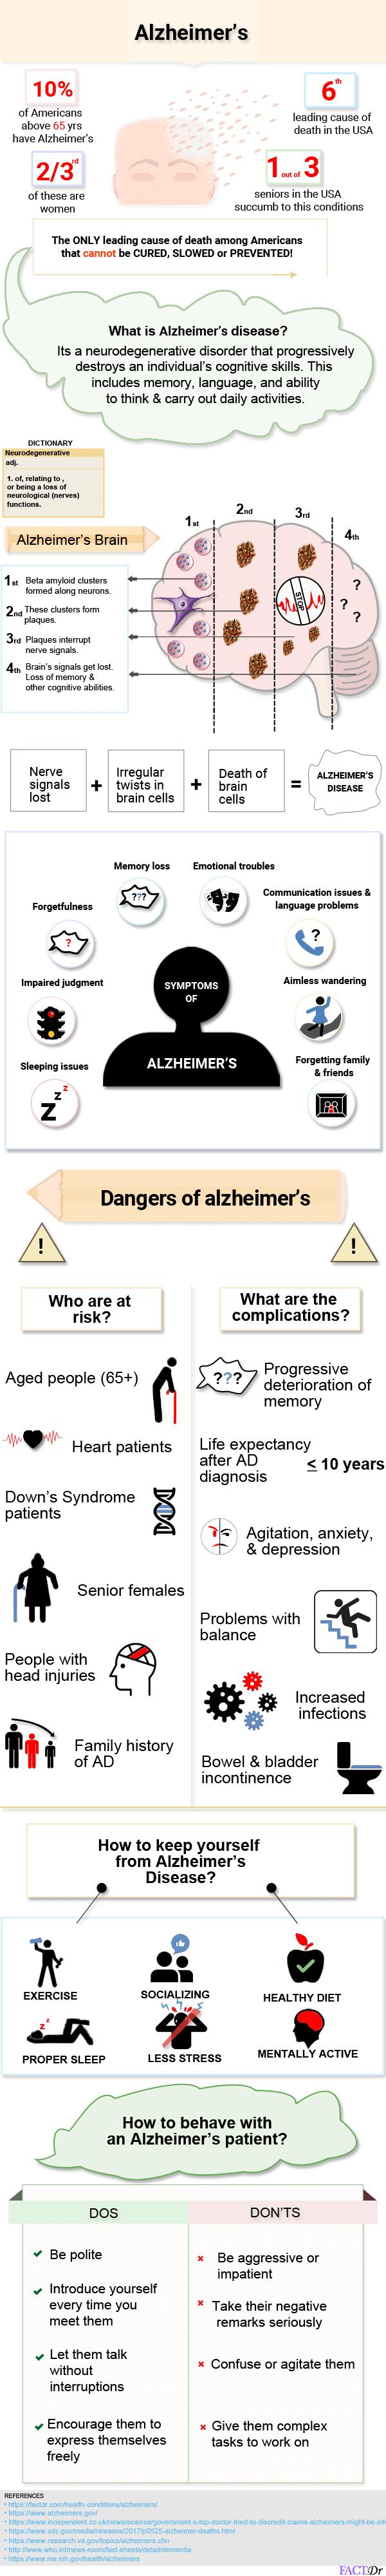 Alzheimer's infographic